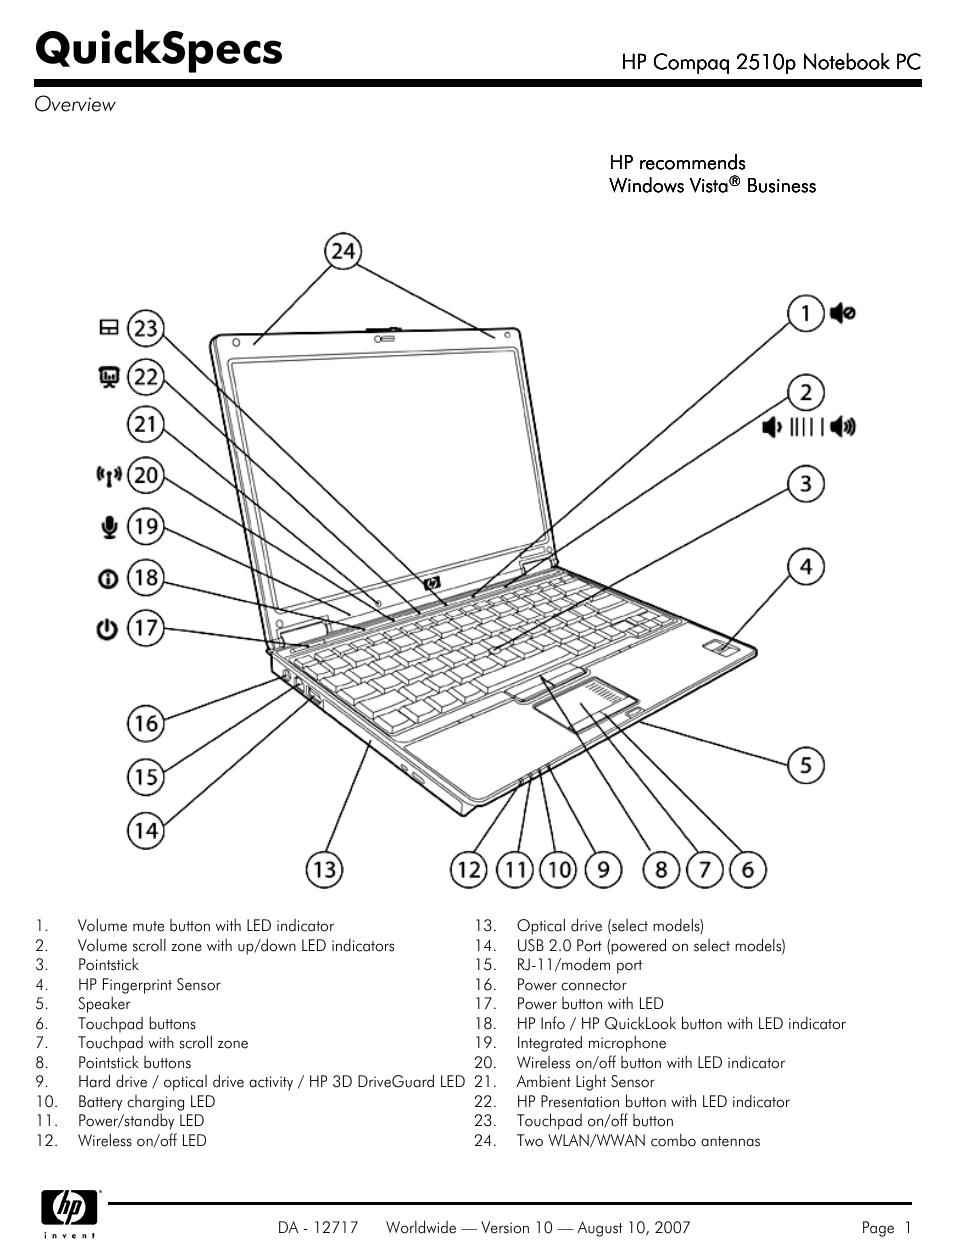 compaq 2510p user manual 39 pages rh manualsdir com HP Compaq 2510P HP Compaq 2510P Notebook Images